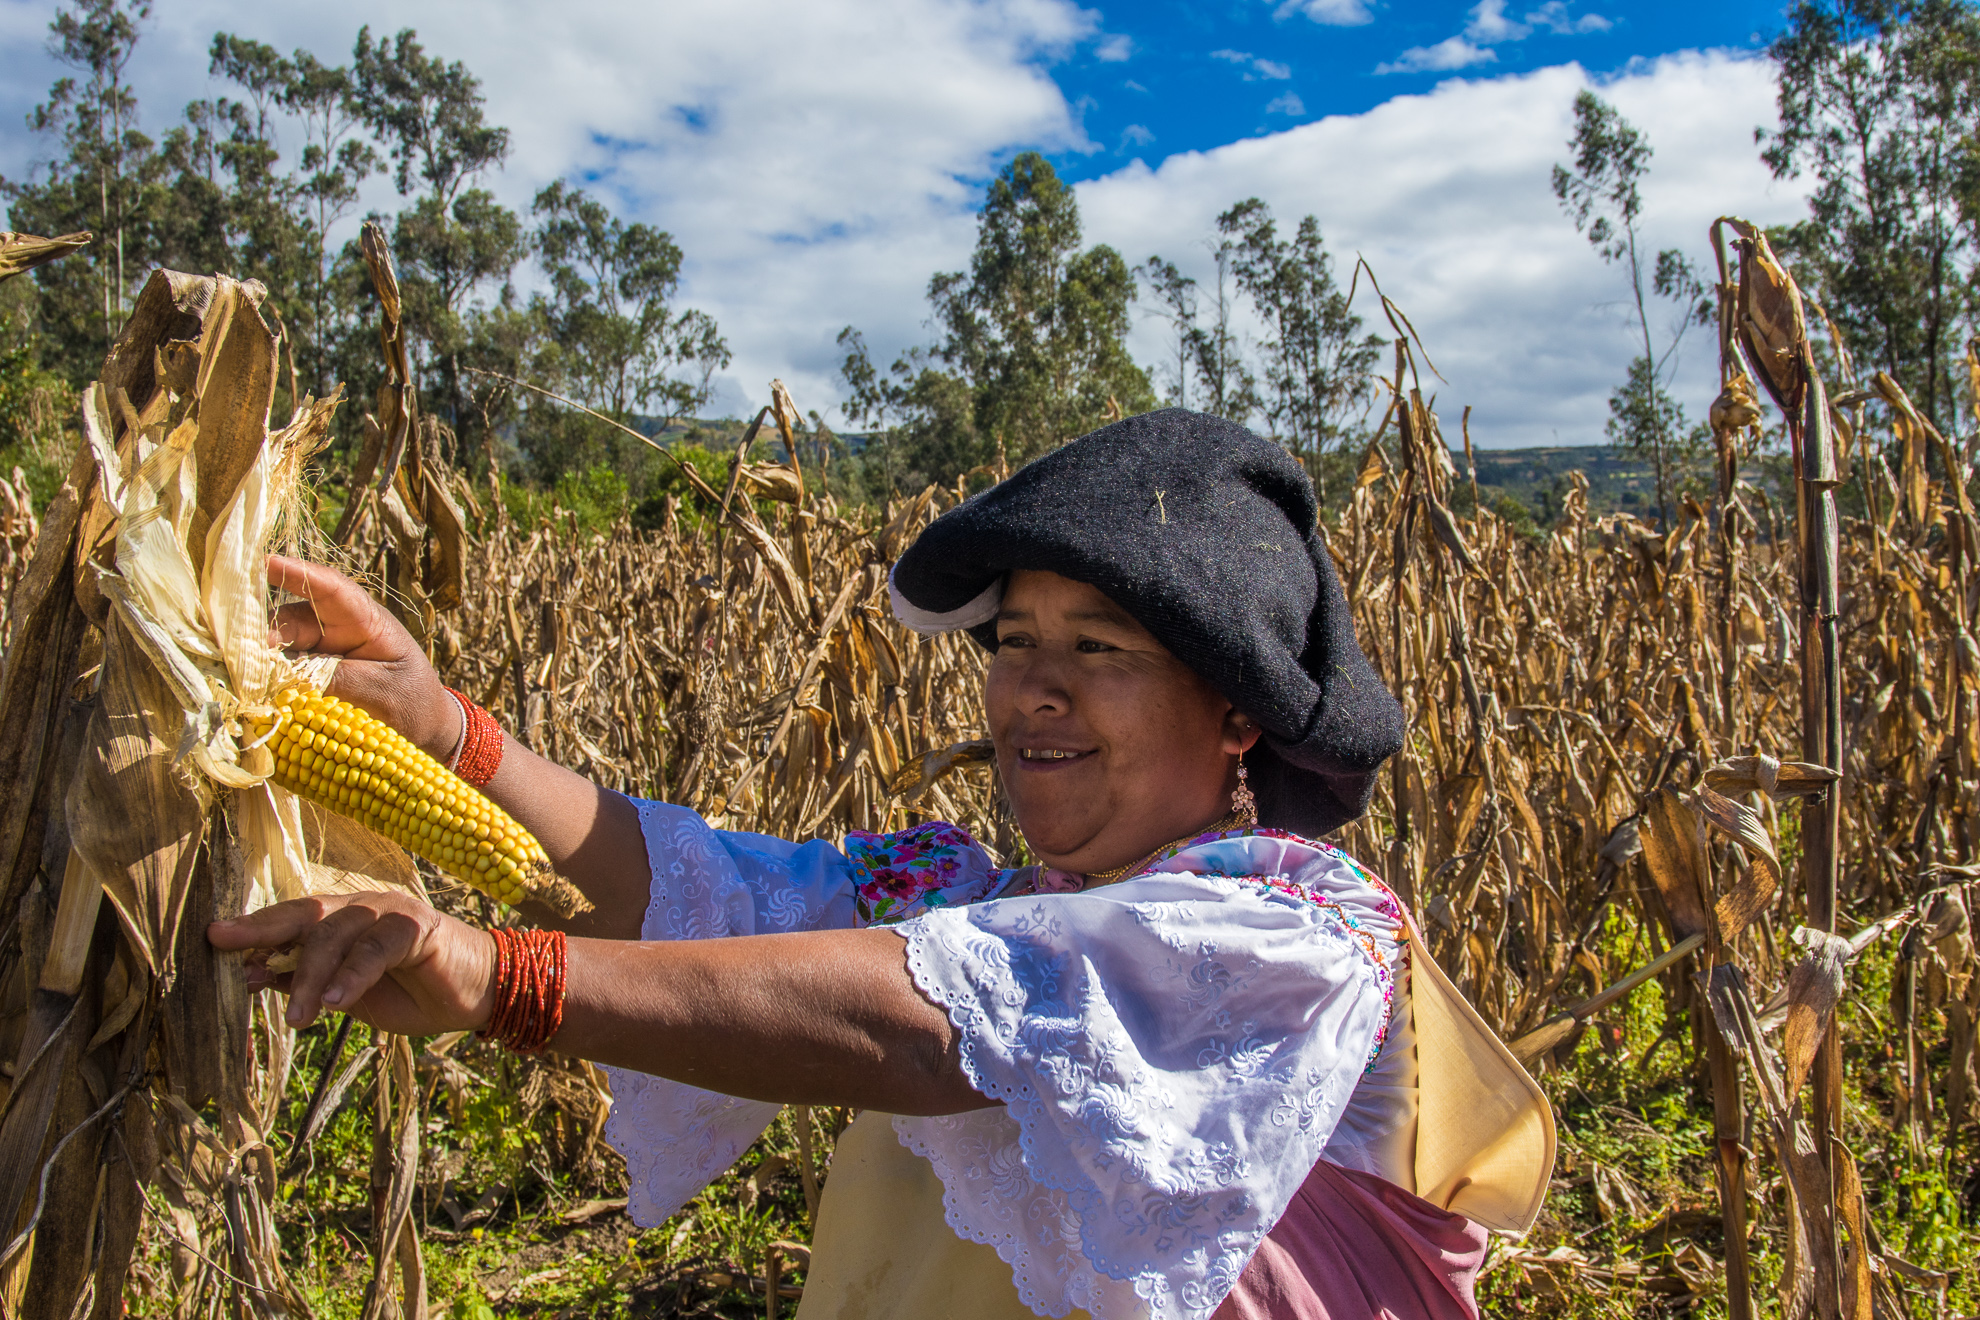 Ecuador - Otavalo area